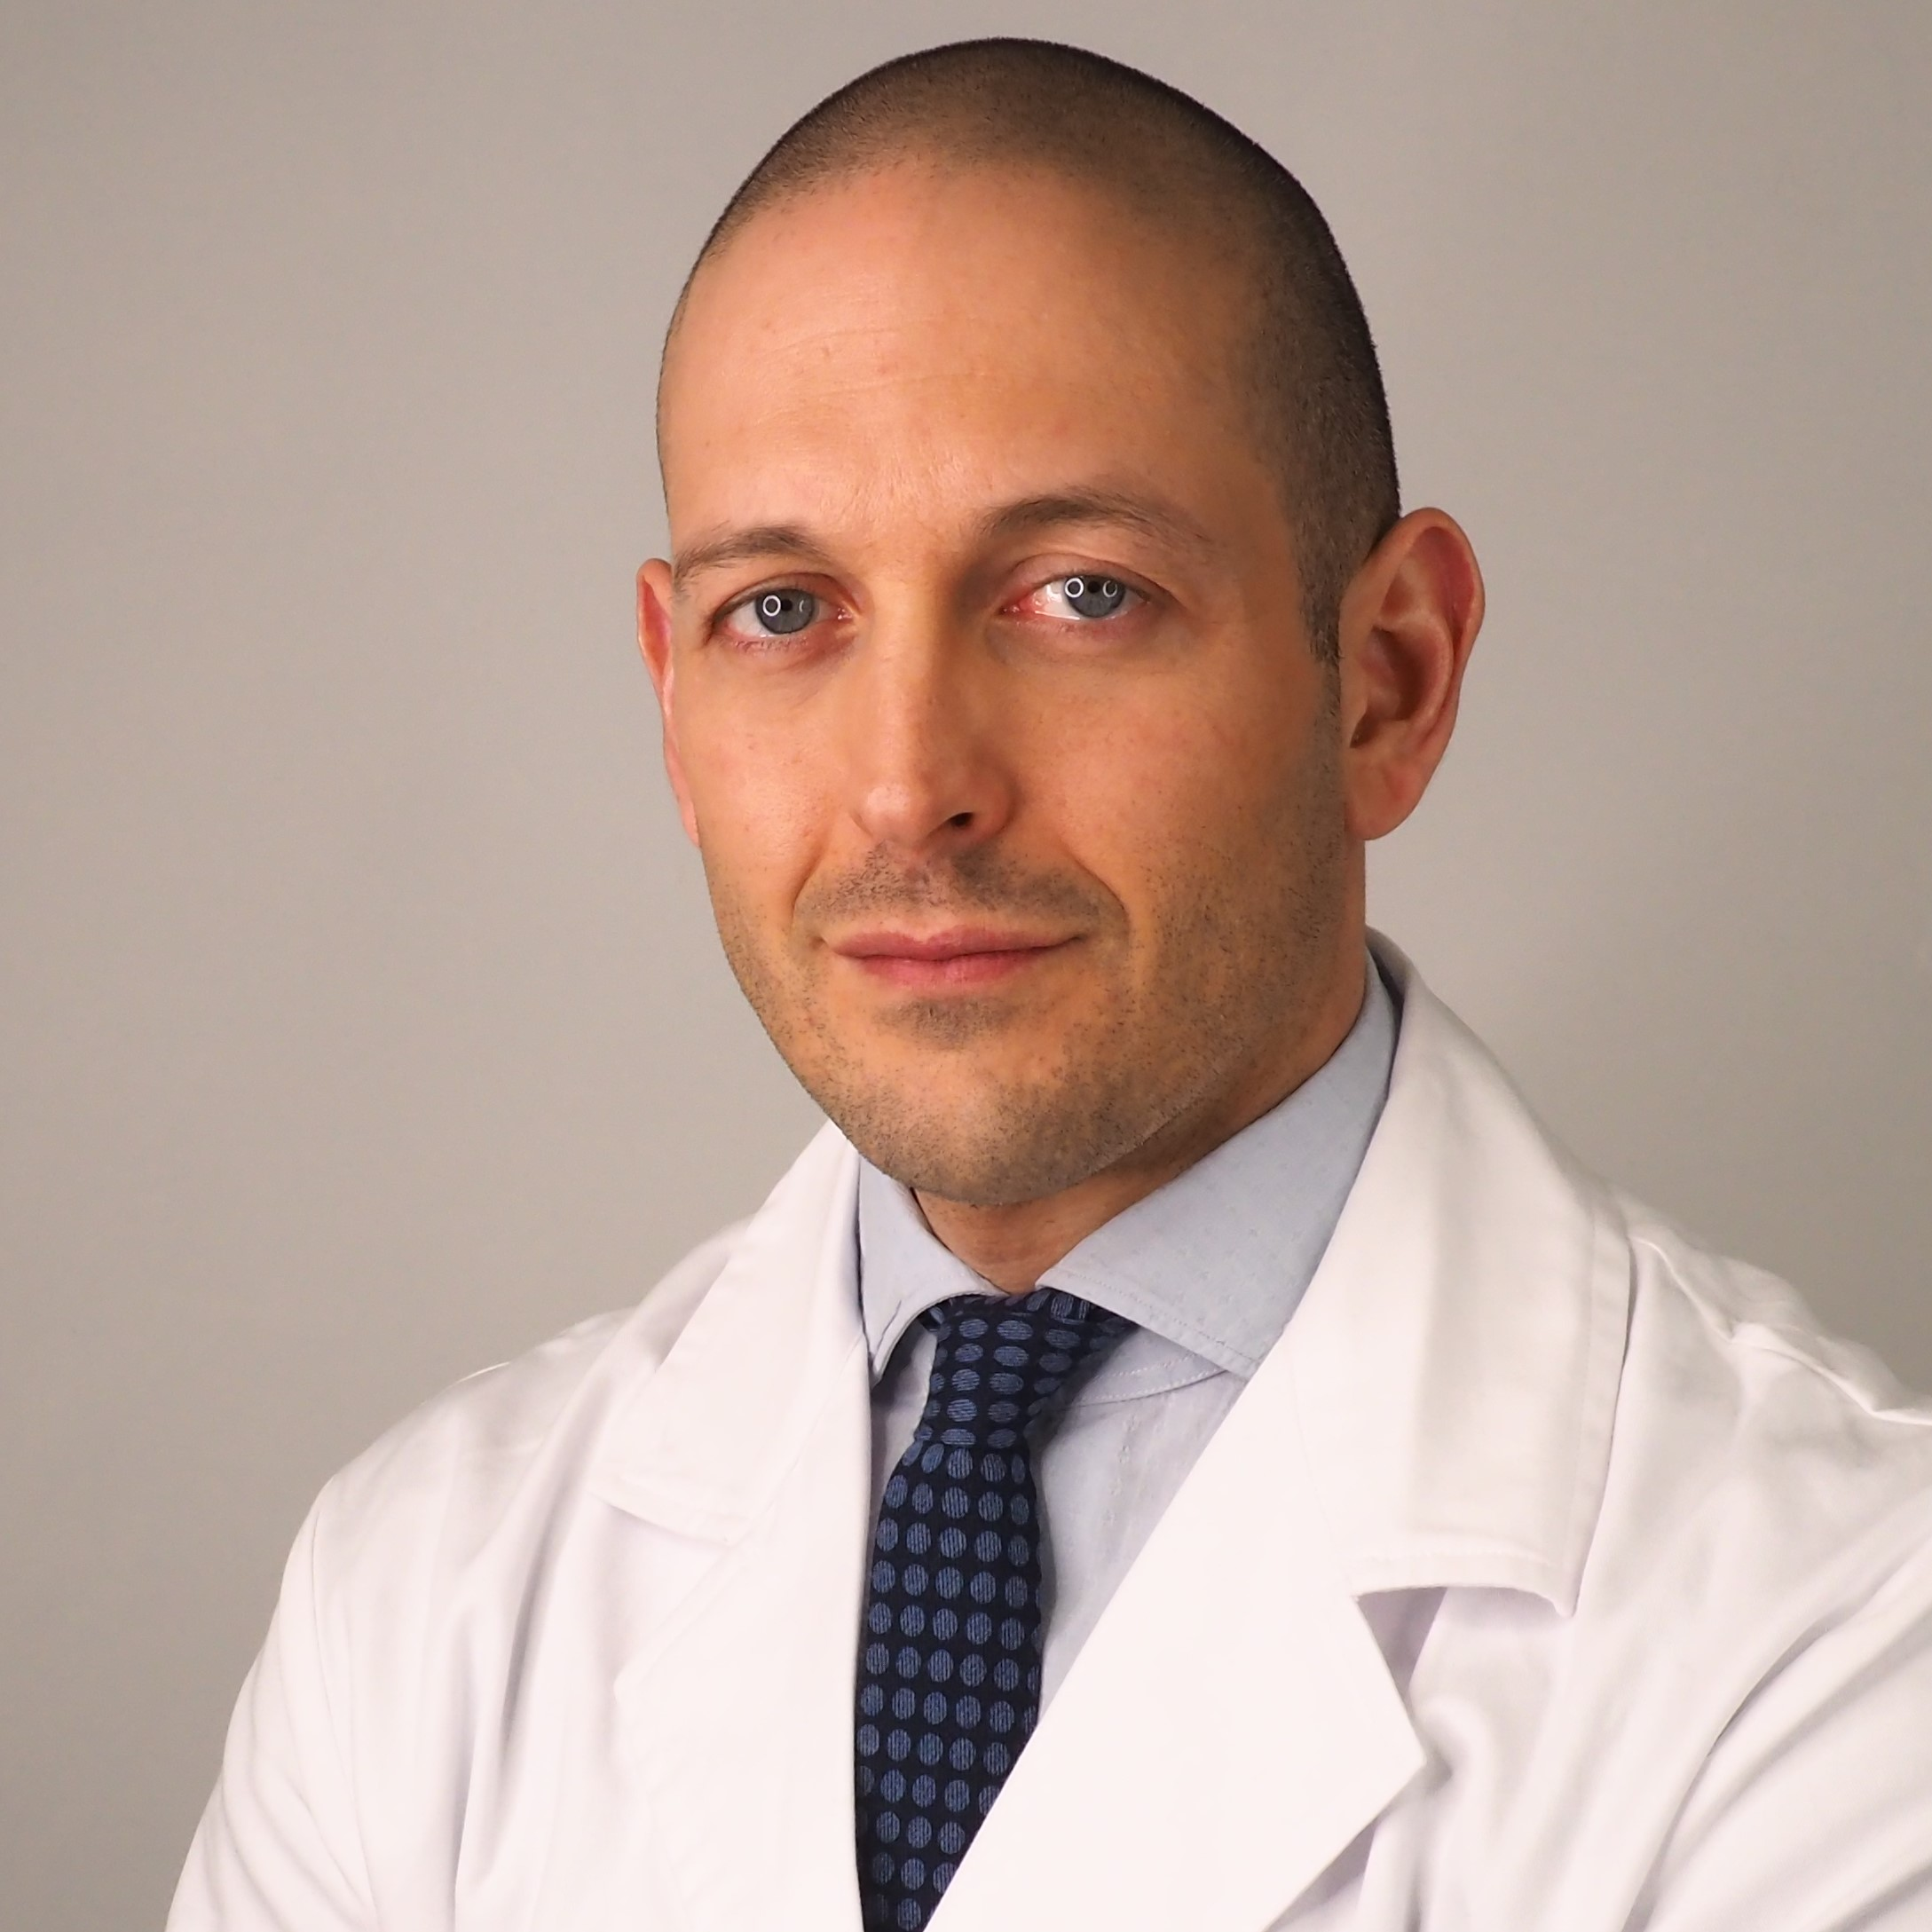 Dott. Federico Tosato